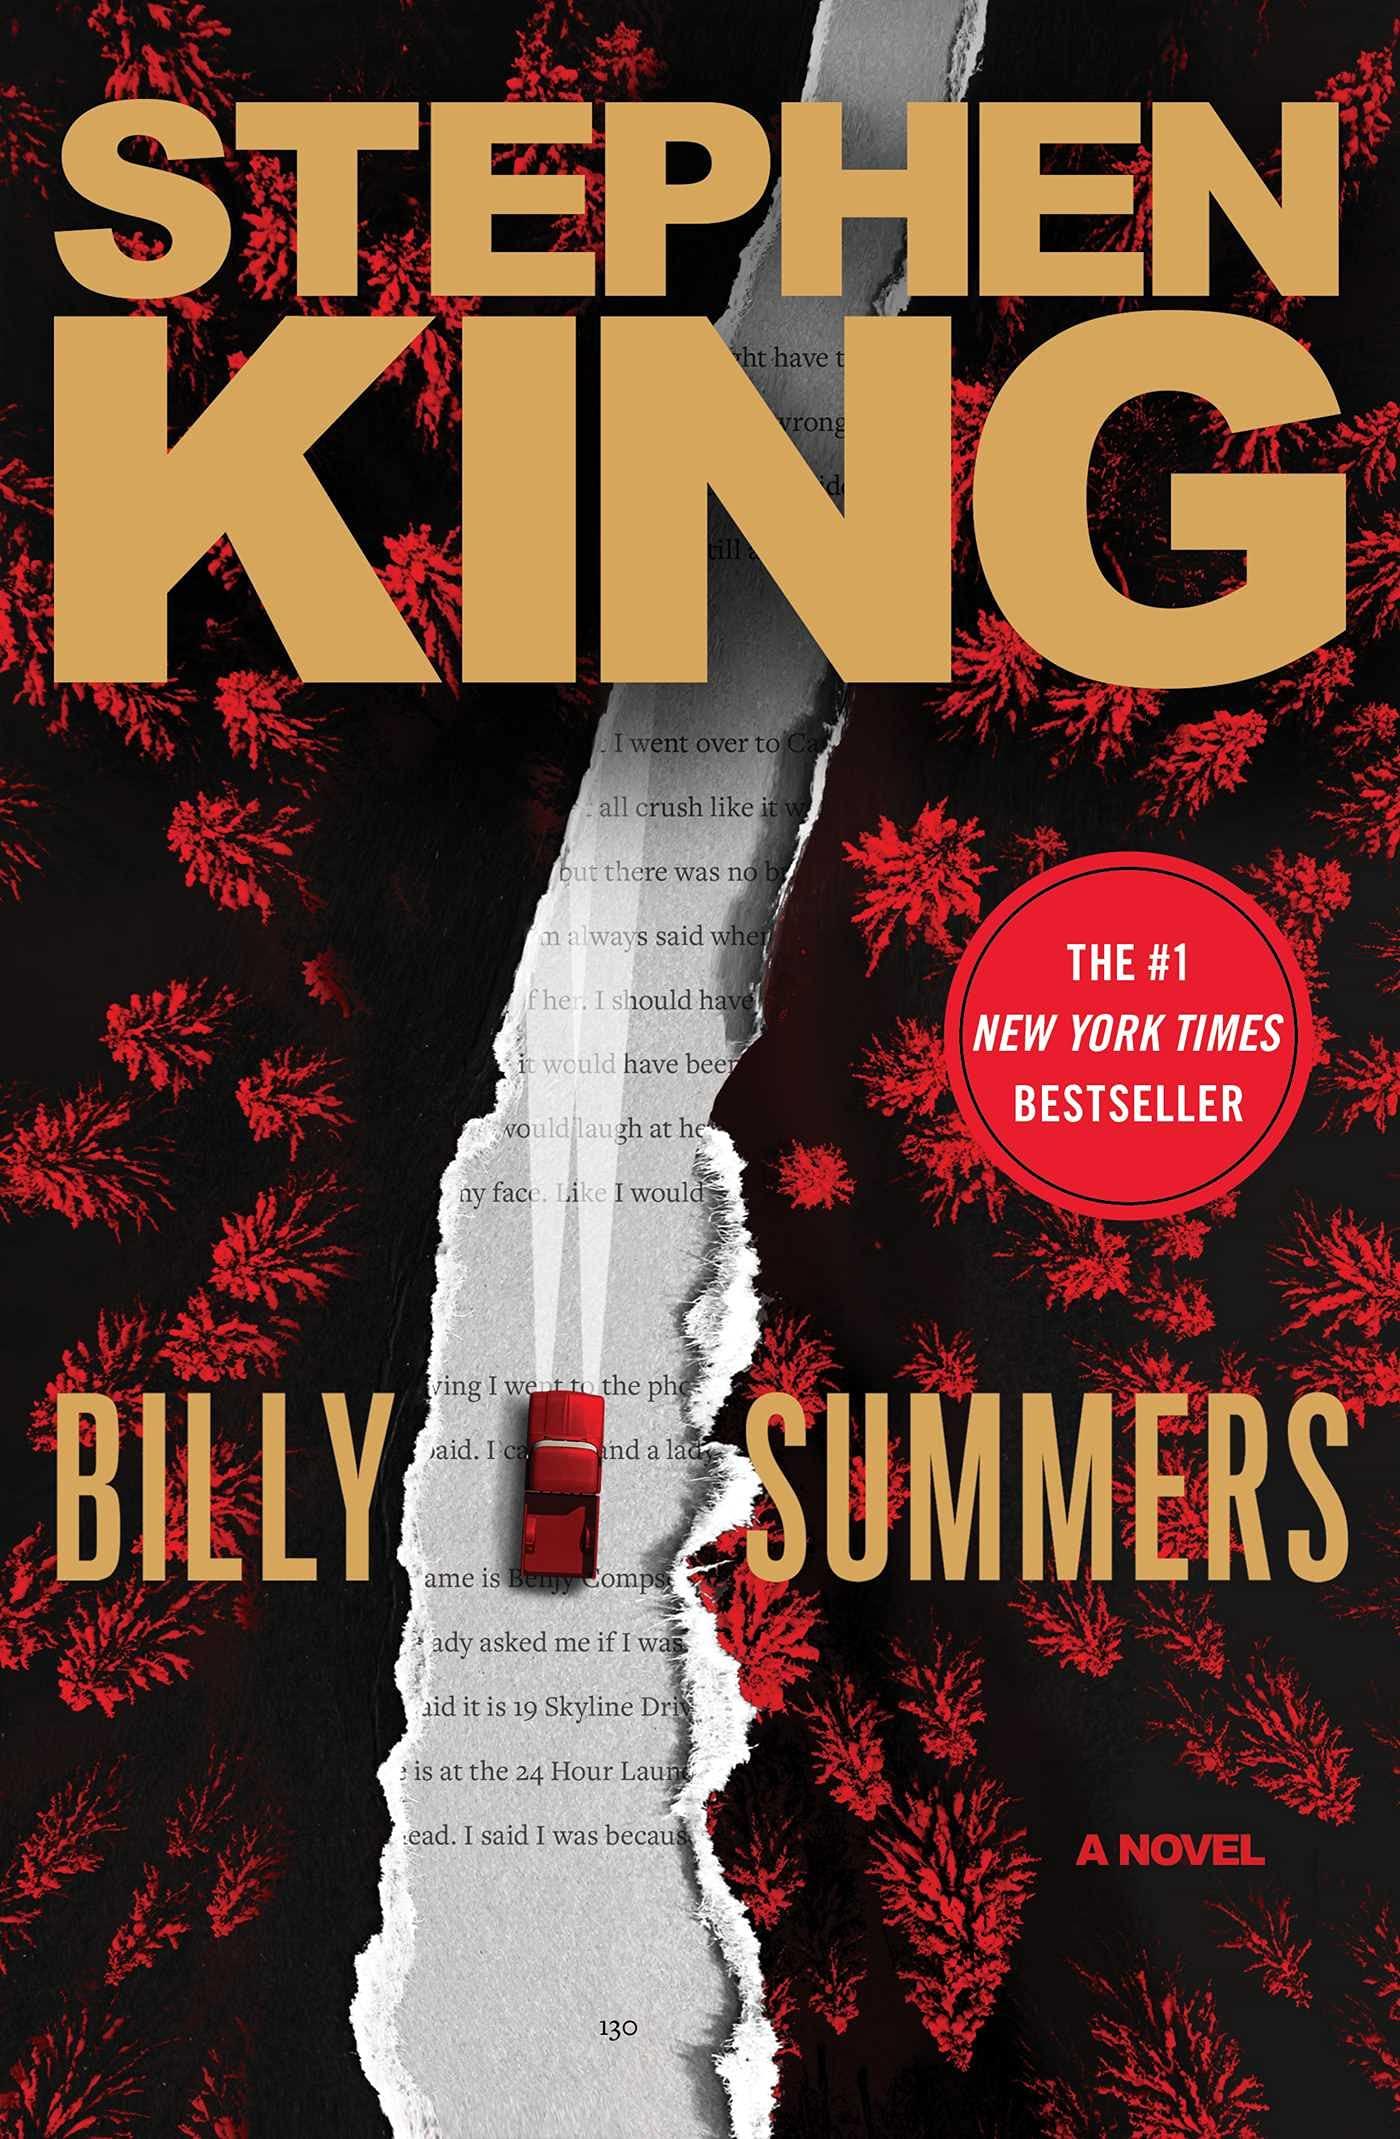 Billy Summers : King, Stephen: Amazon.it: Libri